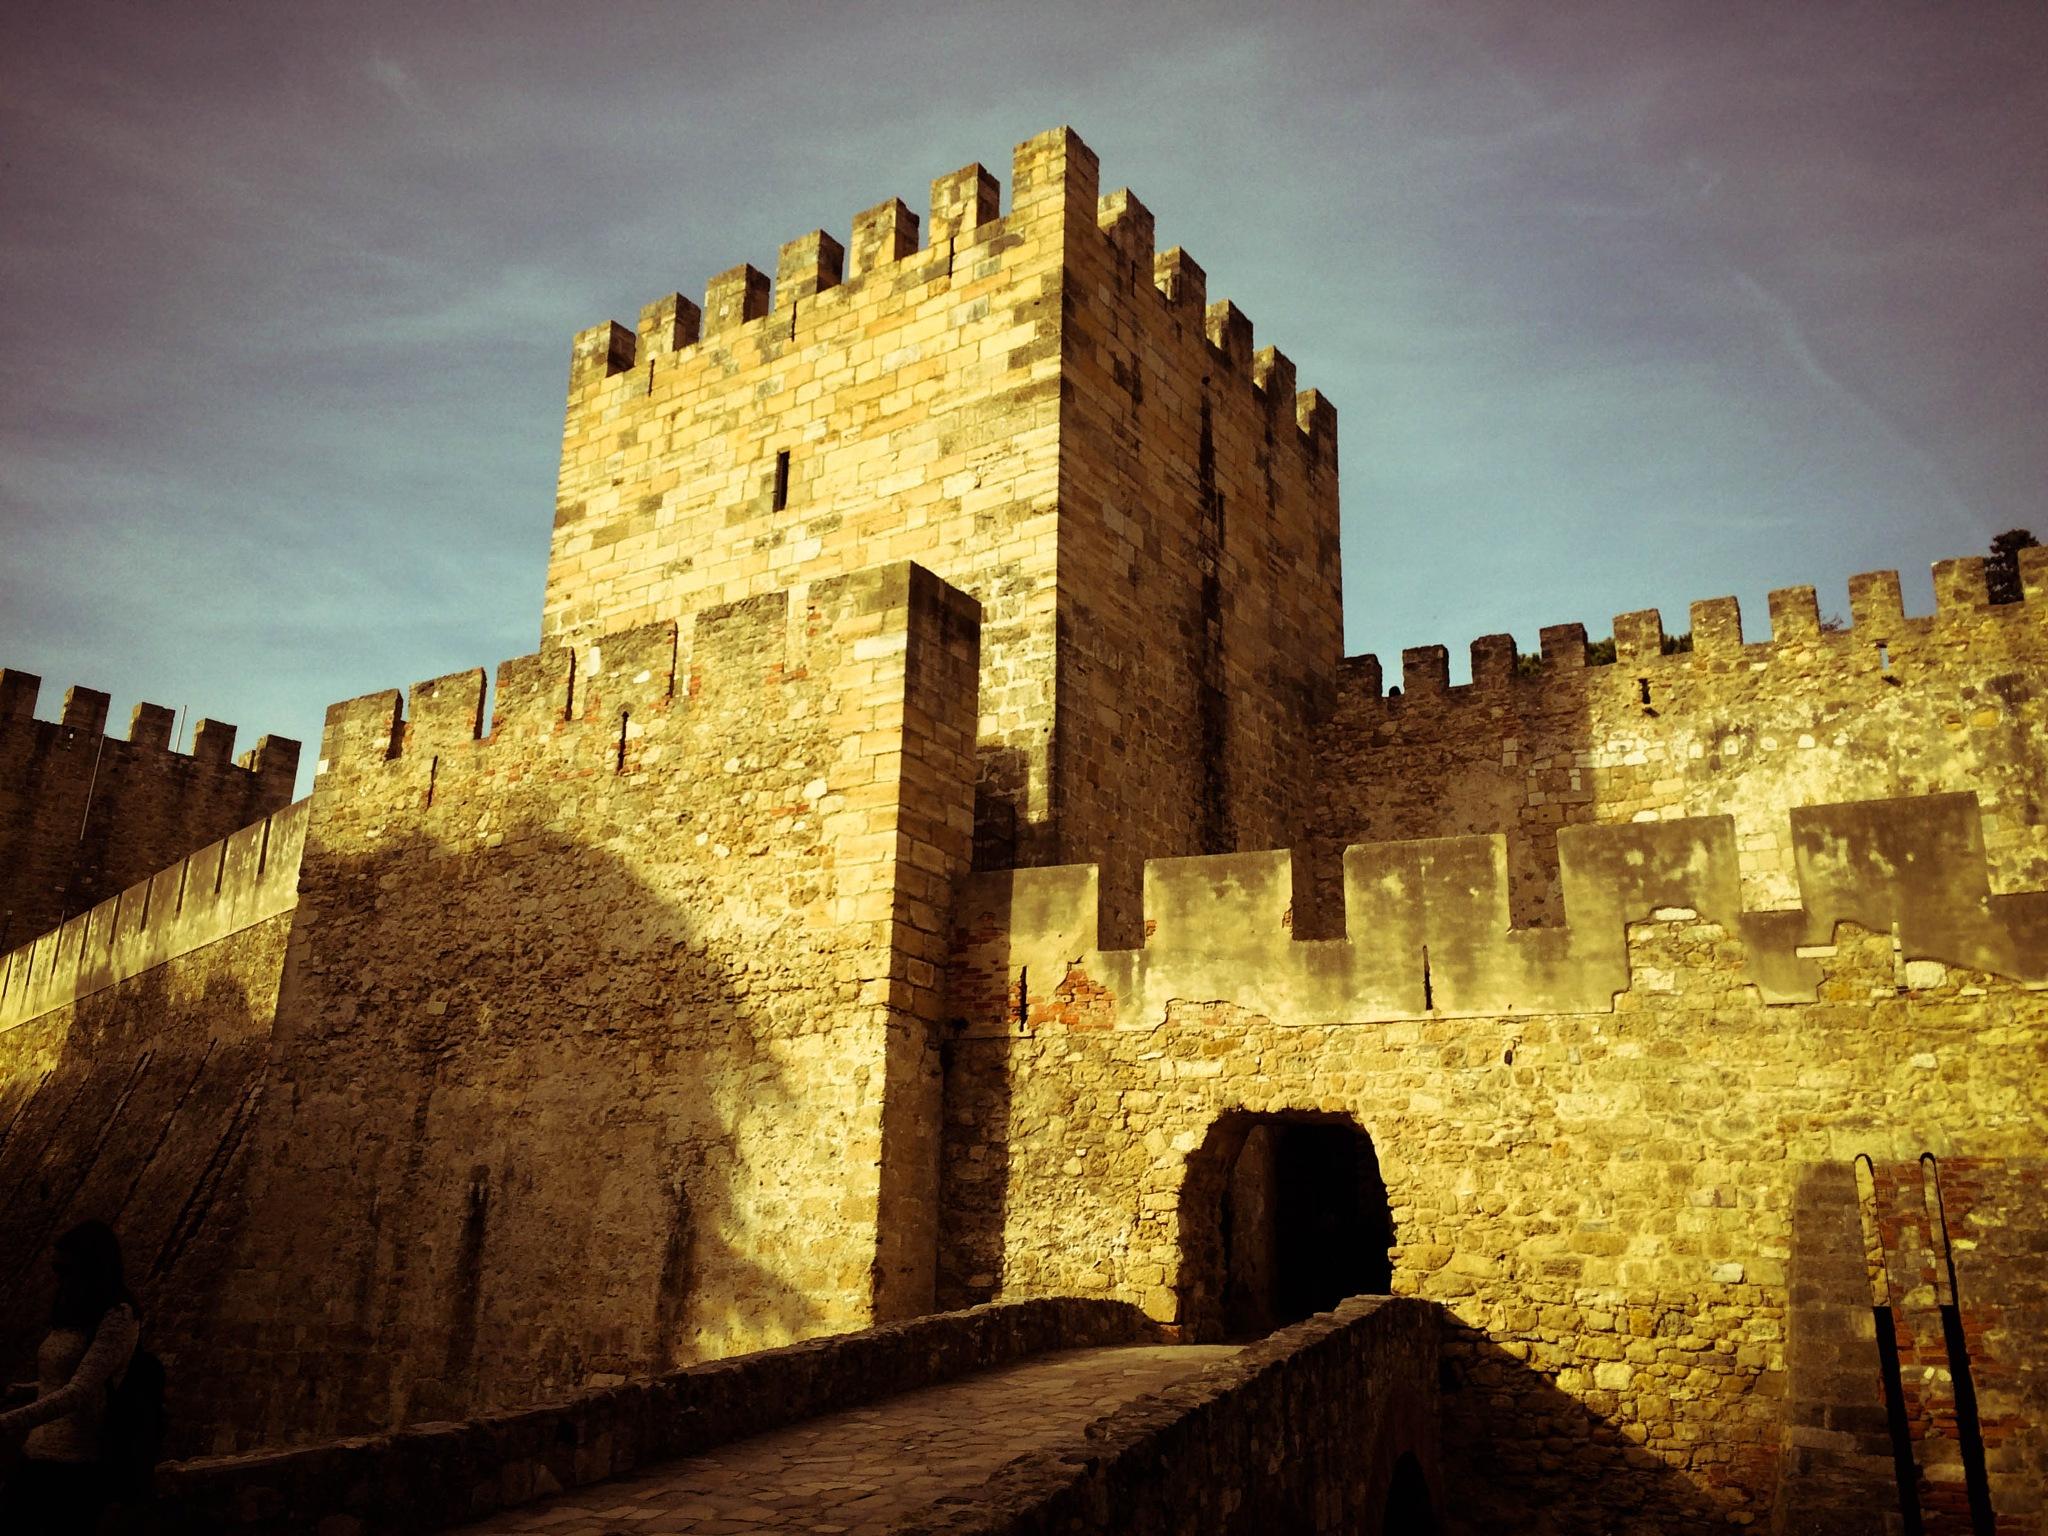 Saint George Castle - Lisbon, Portugal by Leonardo Perin Vichi